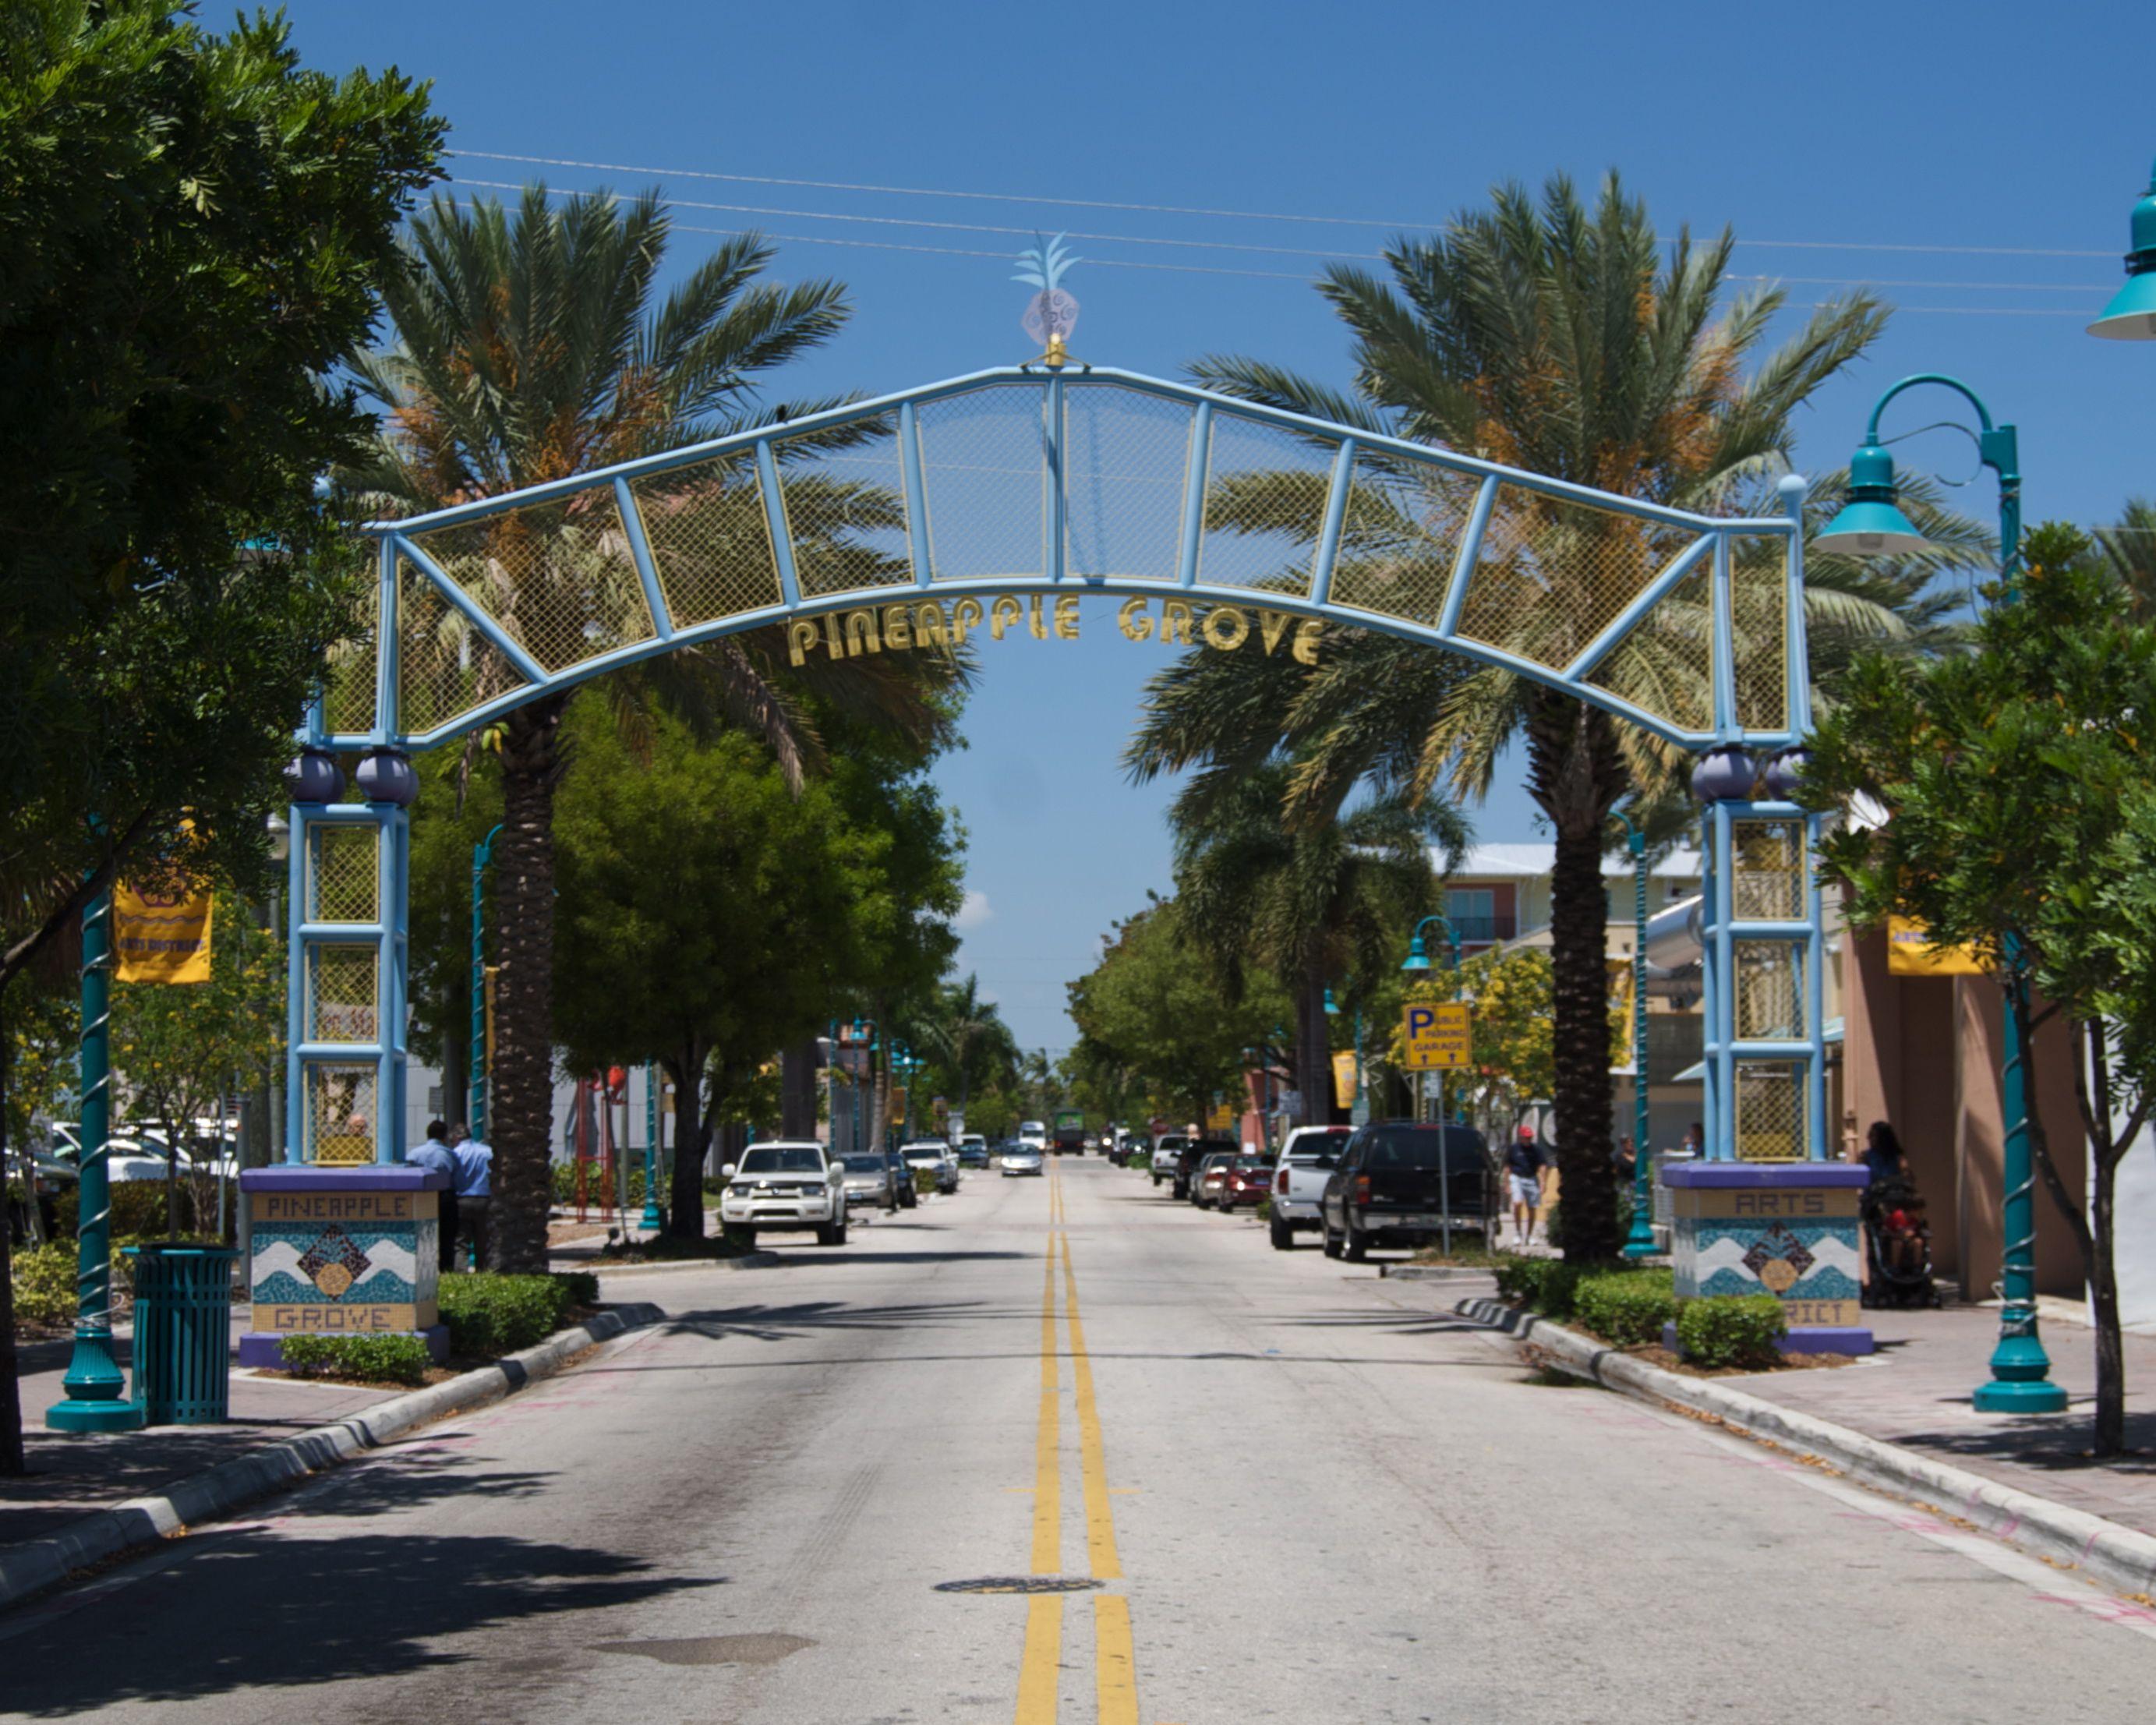 5d29df49c58f107ab0c543c4ee27cec0 - Midtown Imaging Palm Beach Gardens Florida